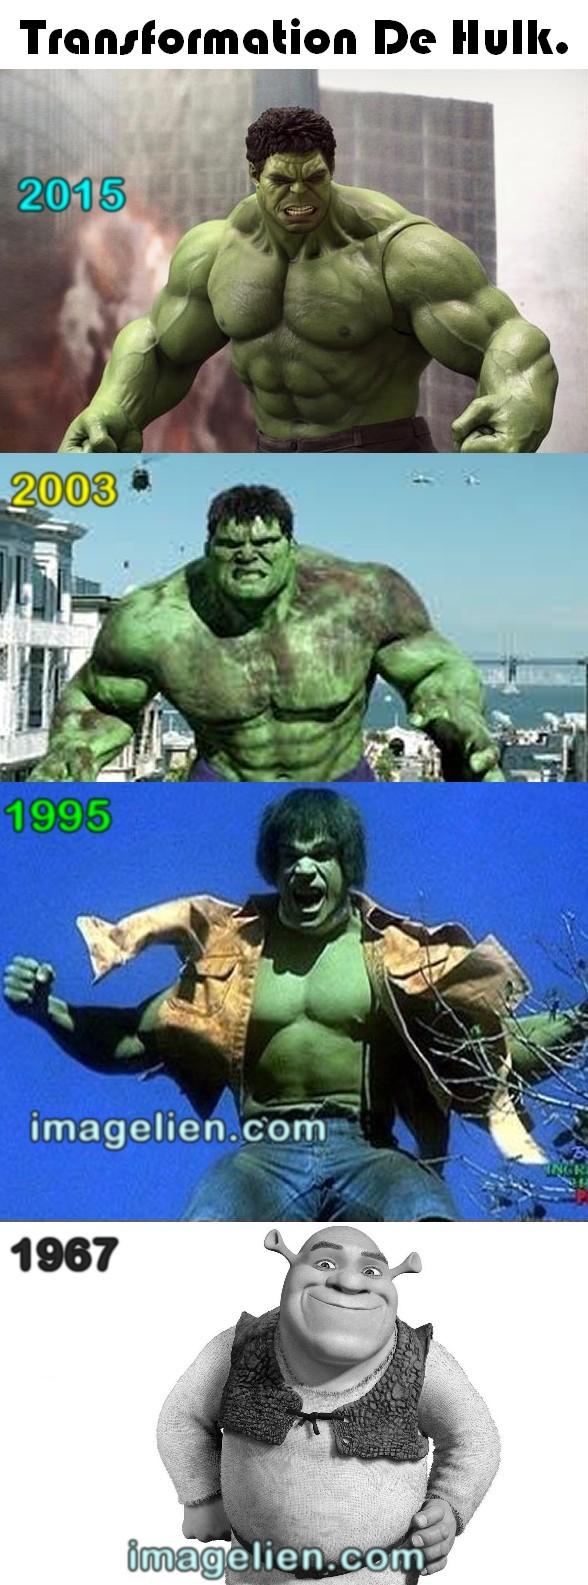 hulk1 imgL